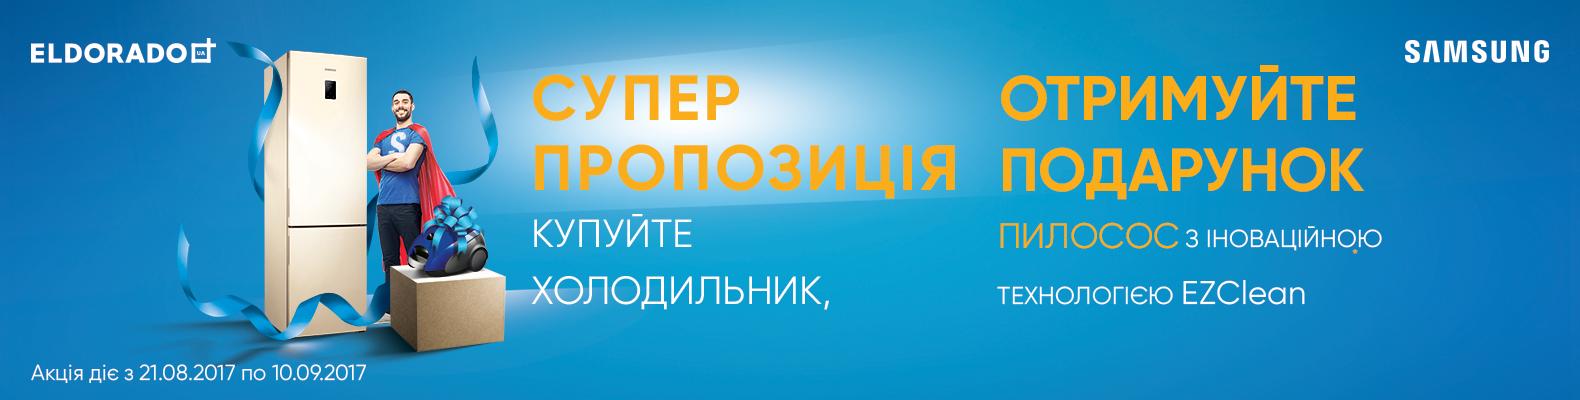 First catalog banner